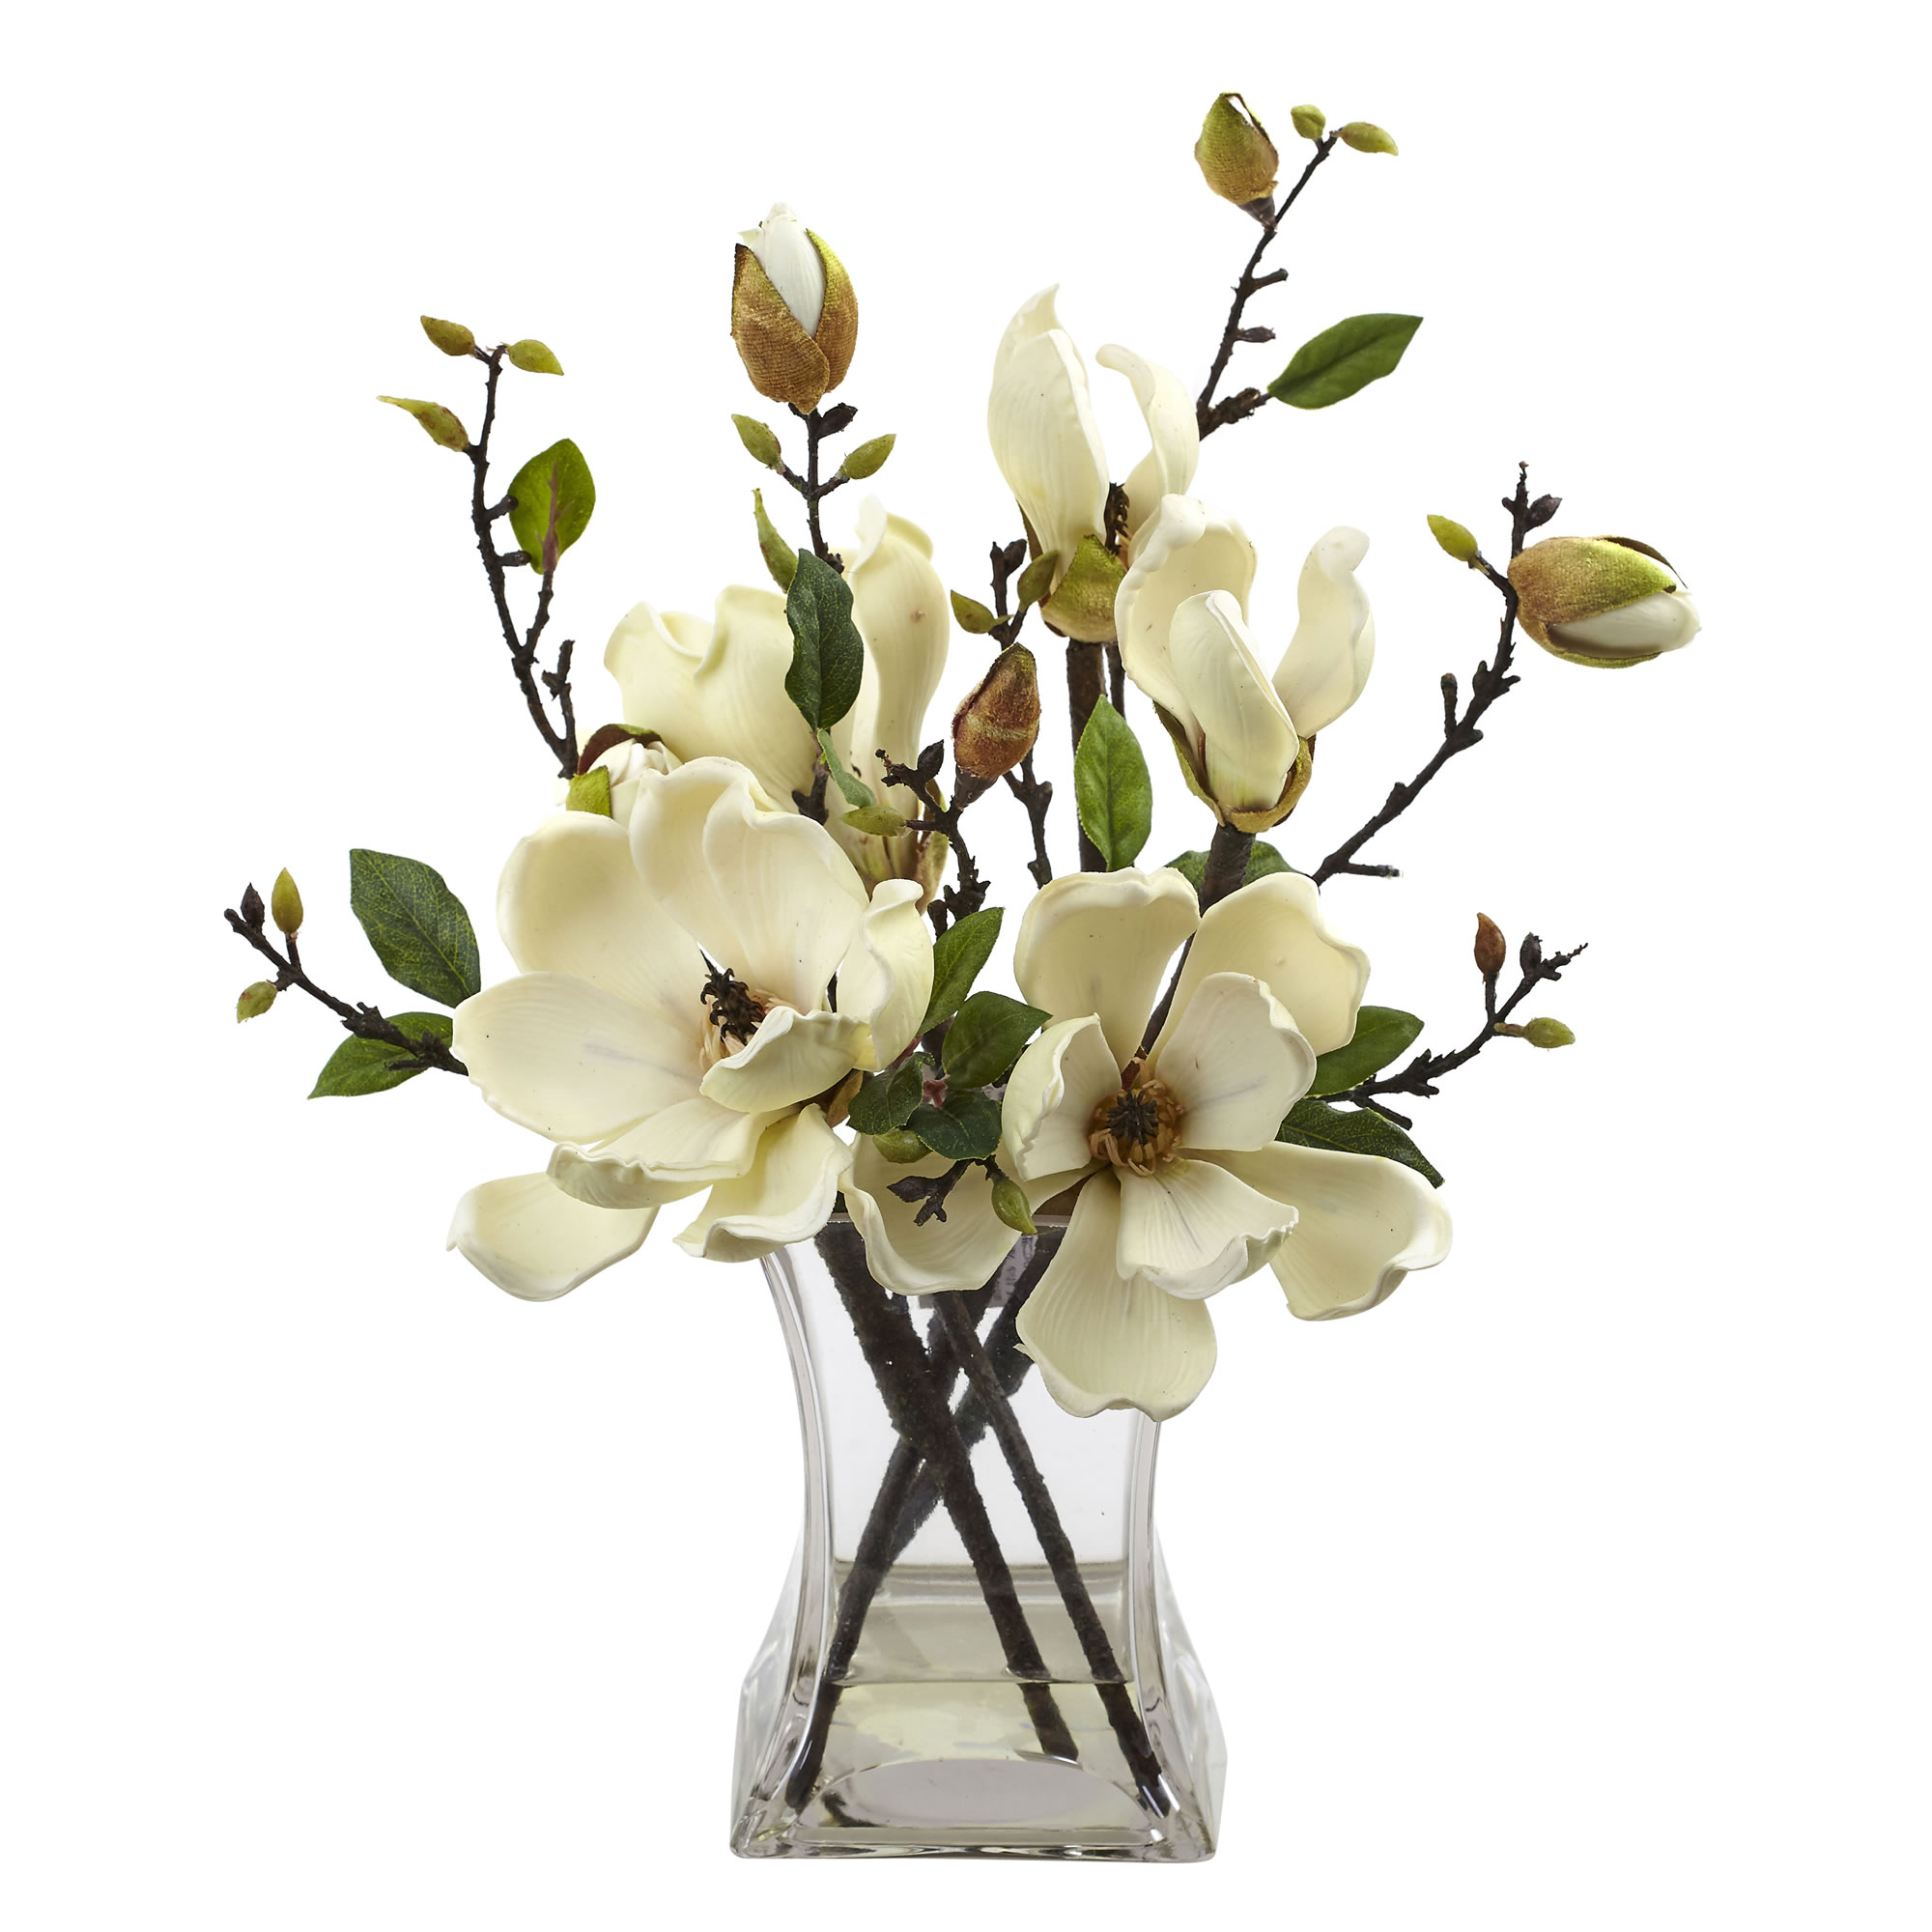 Details About Artificial 15 Magnolia Silk Flowers Floral Arrangement In Faux Water Glass Vase